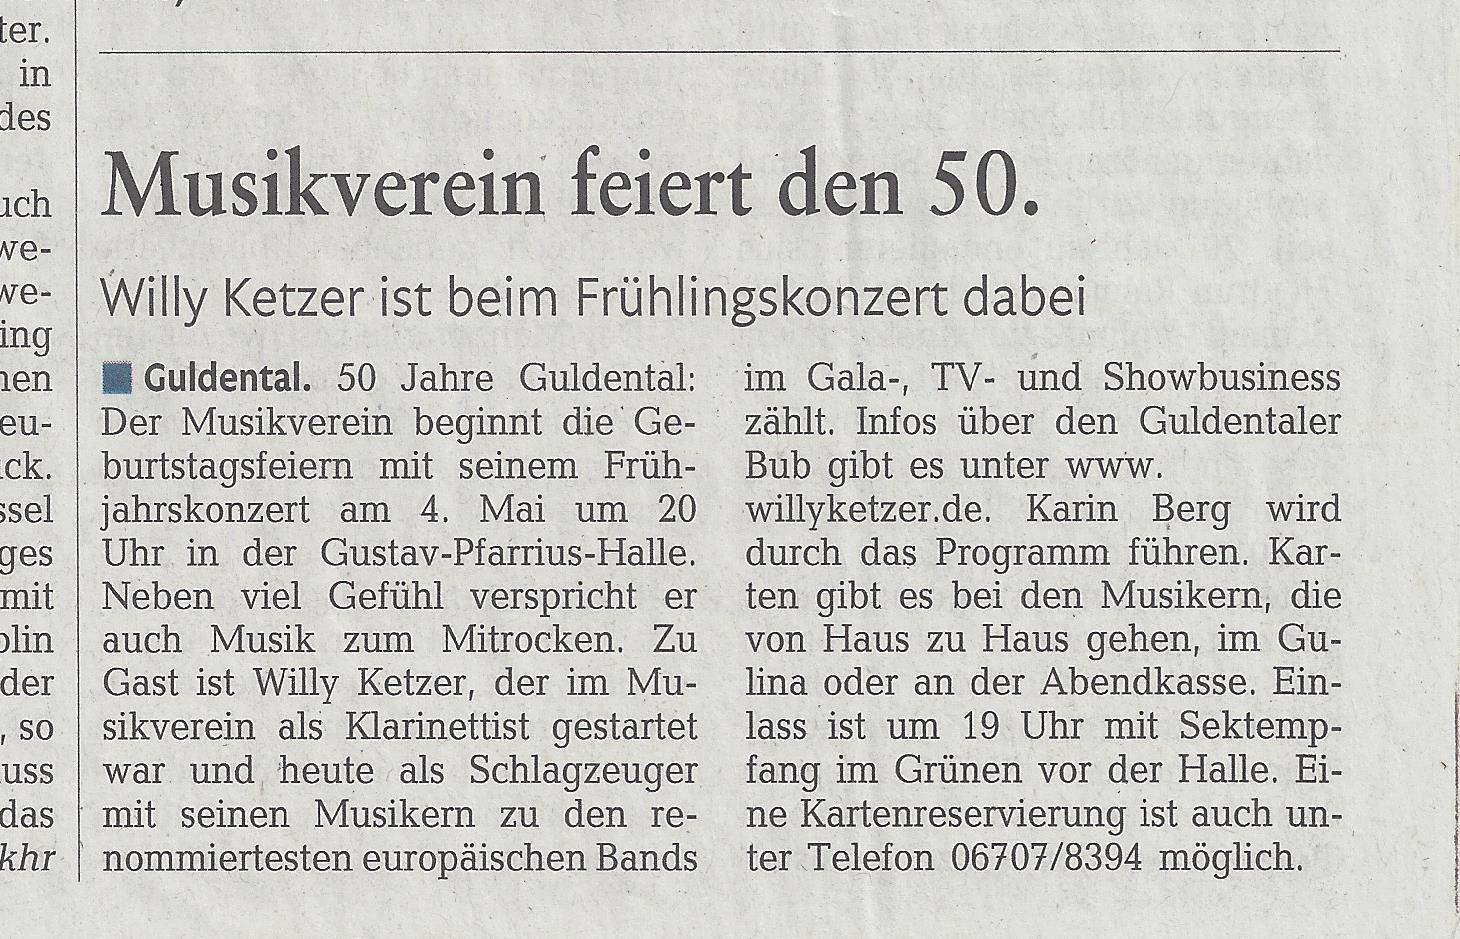 Musikverein feiert den 50.